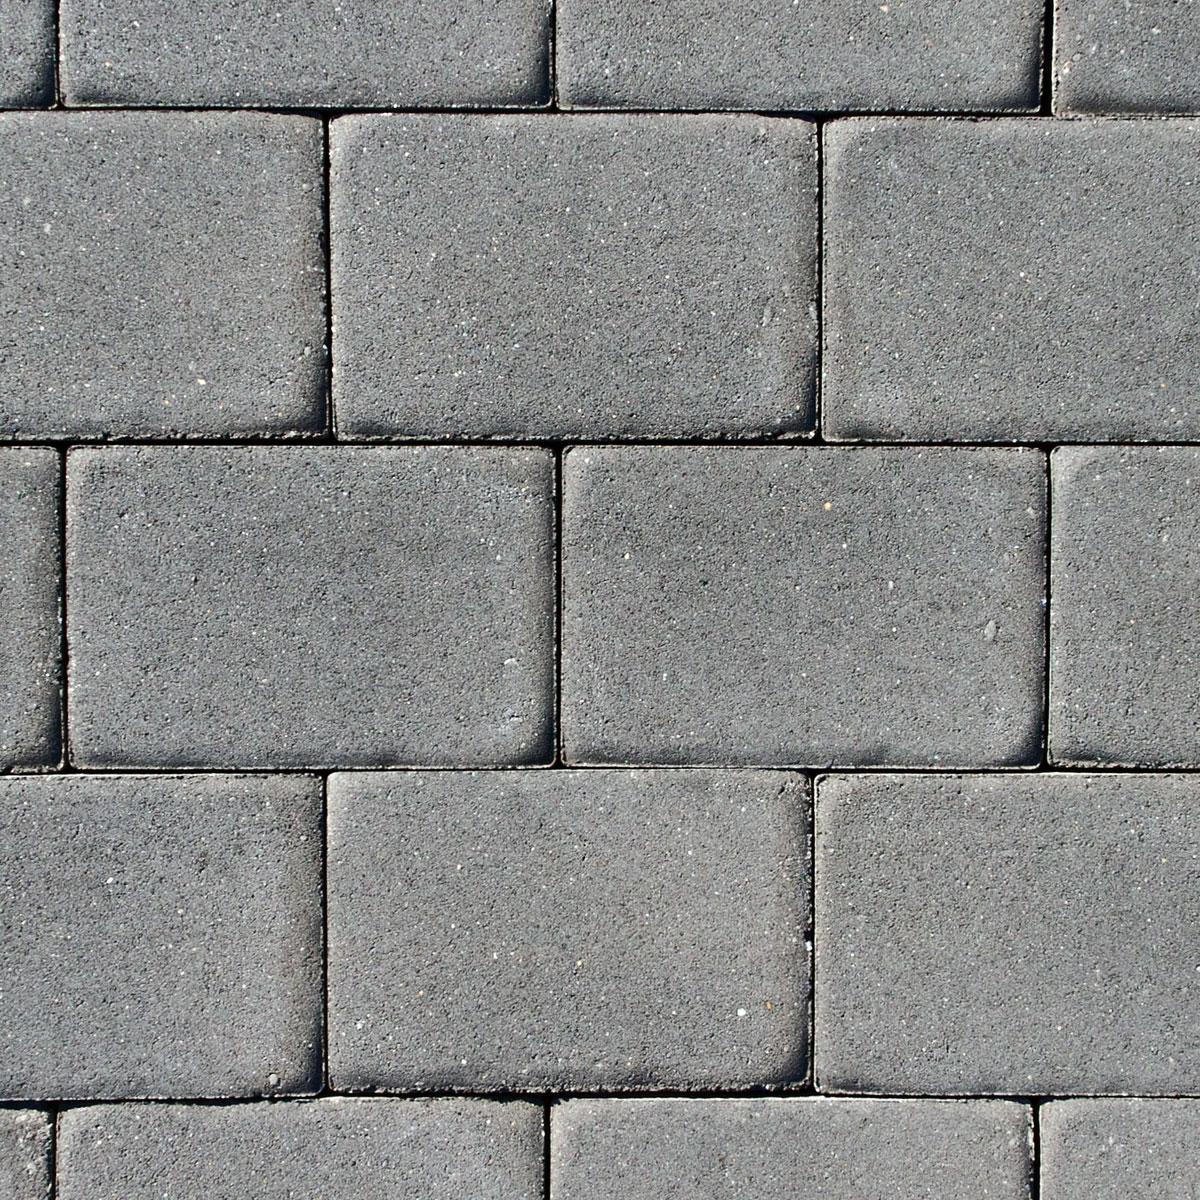 Granite Cobblestone Pavers : Ep henry standard pavers norristown brick